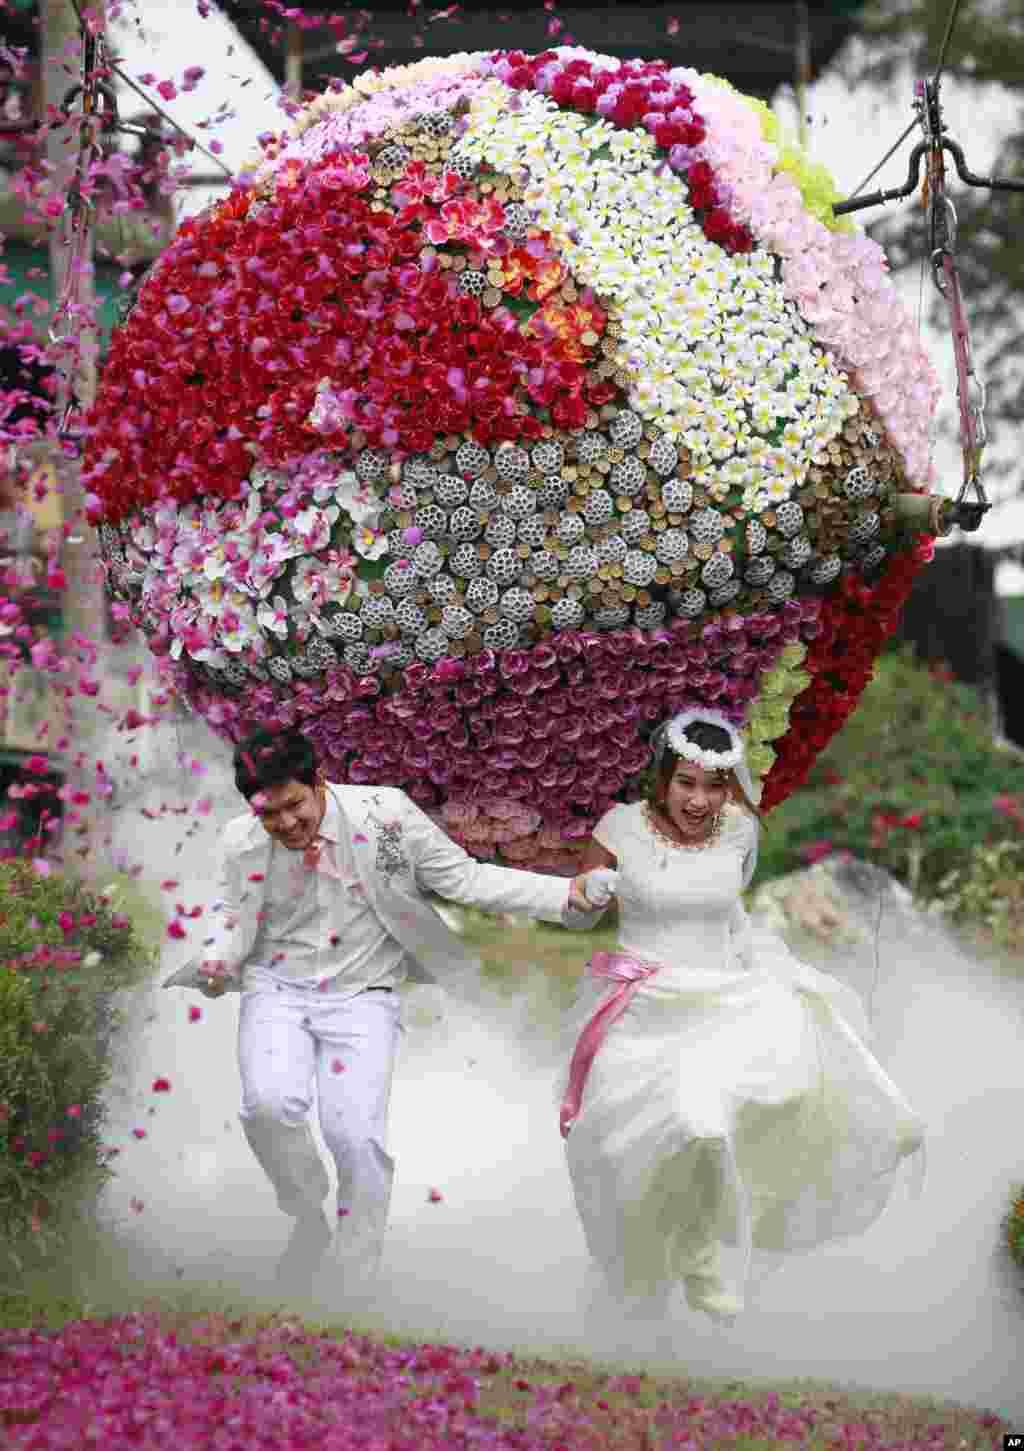 Pasangan pengantin baru: Prasit Rangsitwong (kiri), dan Varutton Rangsitwong berlari menghindari bola raksasa yang dibuat dari bunga-bunga, sebagai bagian dari perayaan acara pernikahan mereka di provinsi Prachinburi, Thailand, yang dilangsungkan pada malam menjelang hari kasih sayang atau Valentine's Day.